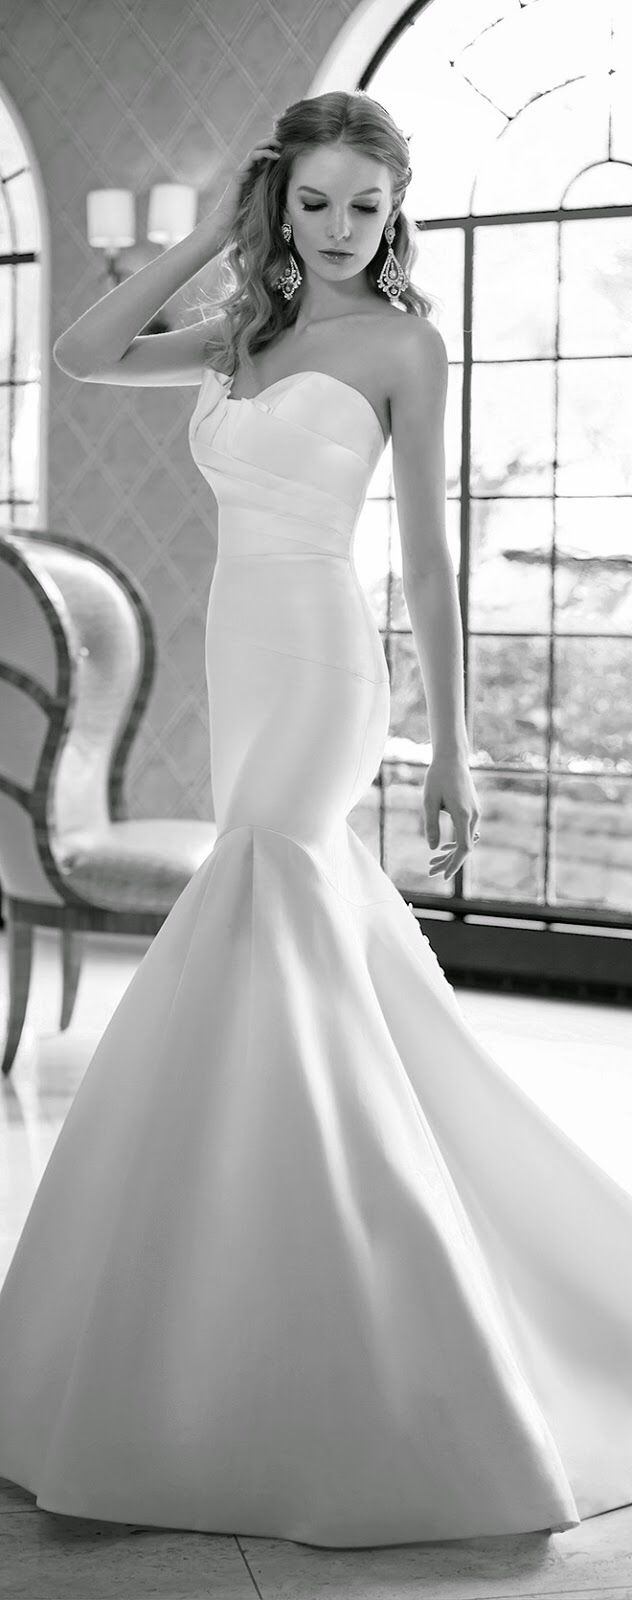 Image from http://4.bp.blogspot.com/-fqlBs83fHT0/VBHgWSYCCkI/AAAAAAAAxSY/dwnYGhnutTw/s1600/wedding-dresses-martina-liana-spring-2015-bridal-collection-582_alt3_zoom.jpg.